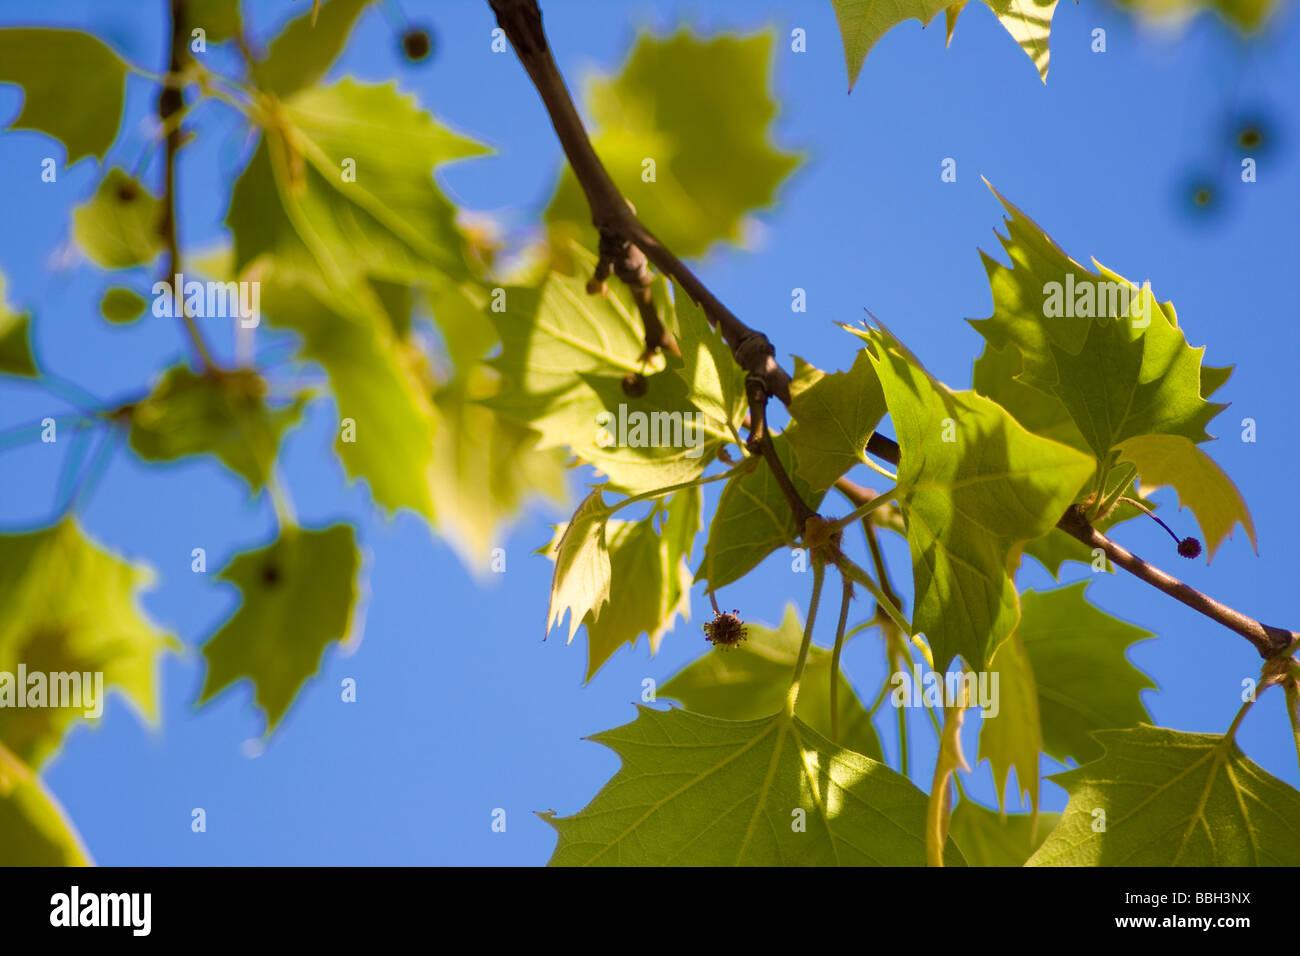 sharp focus shot of tree leaves against a deep blue sky stock